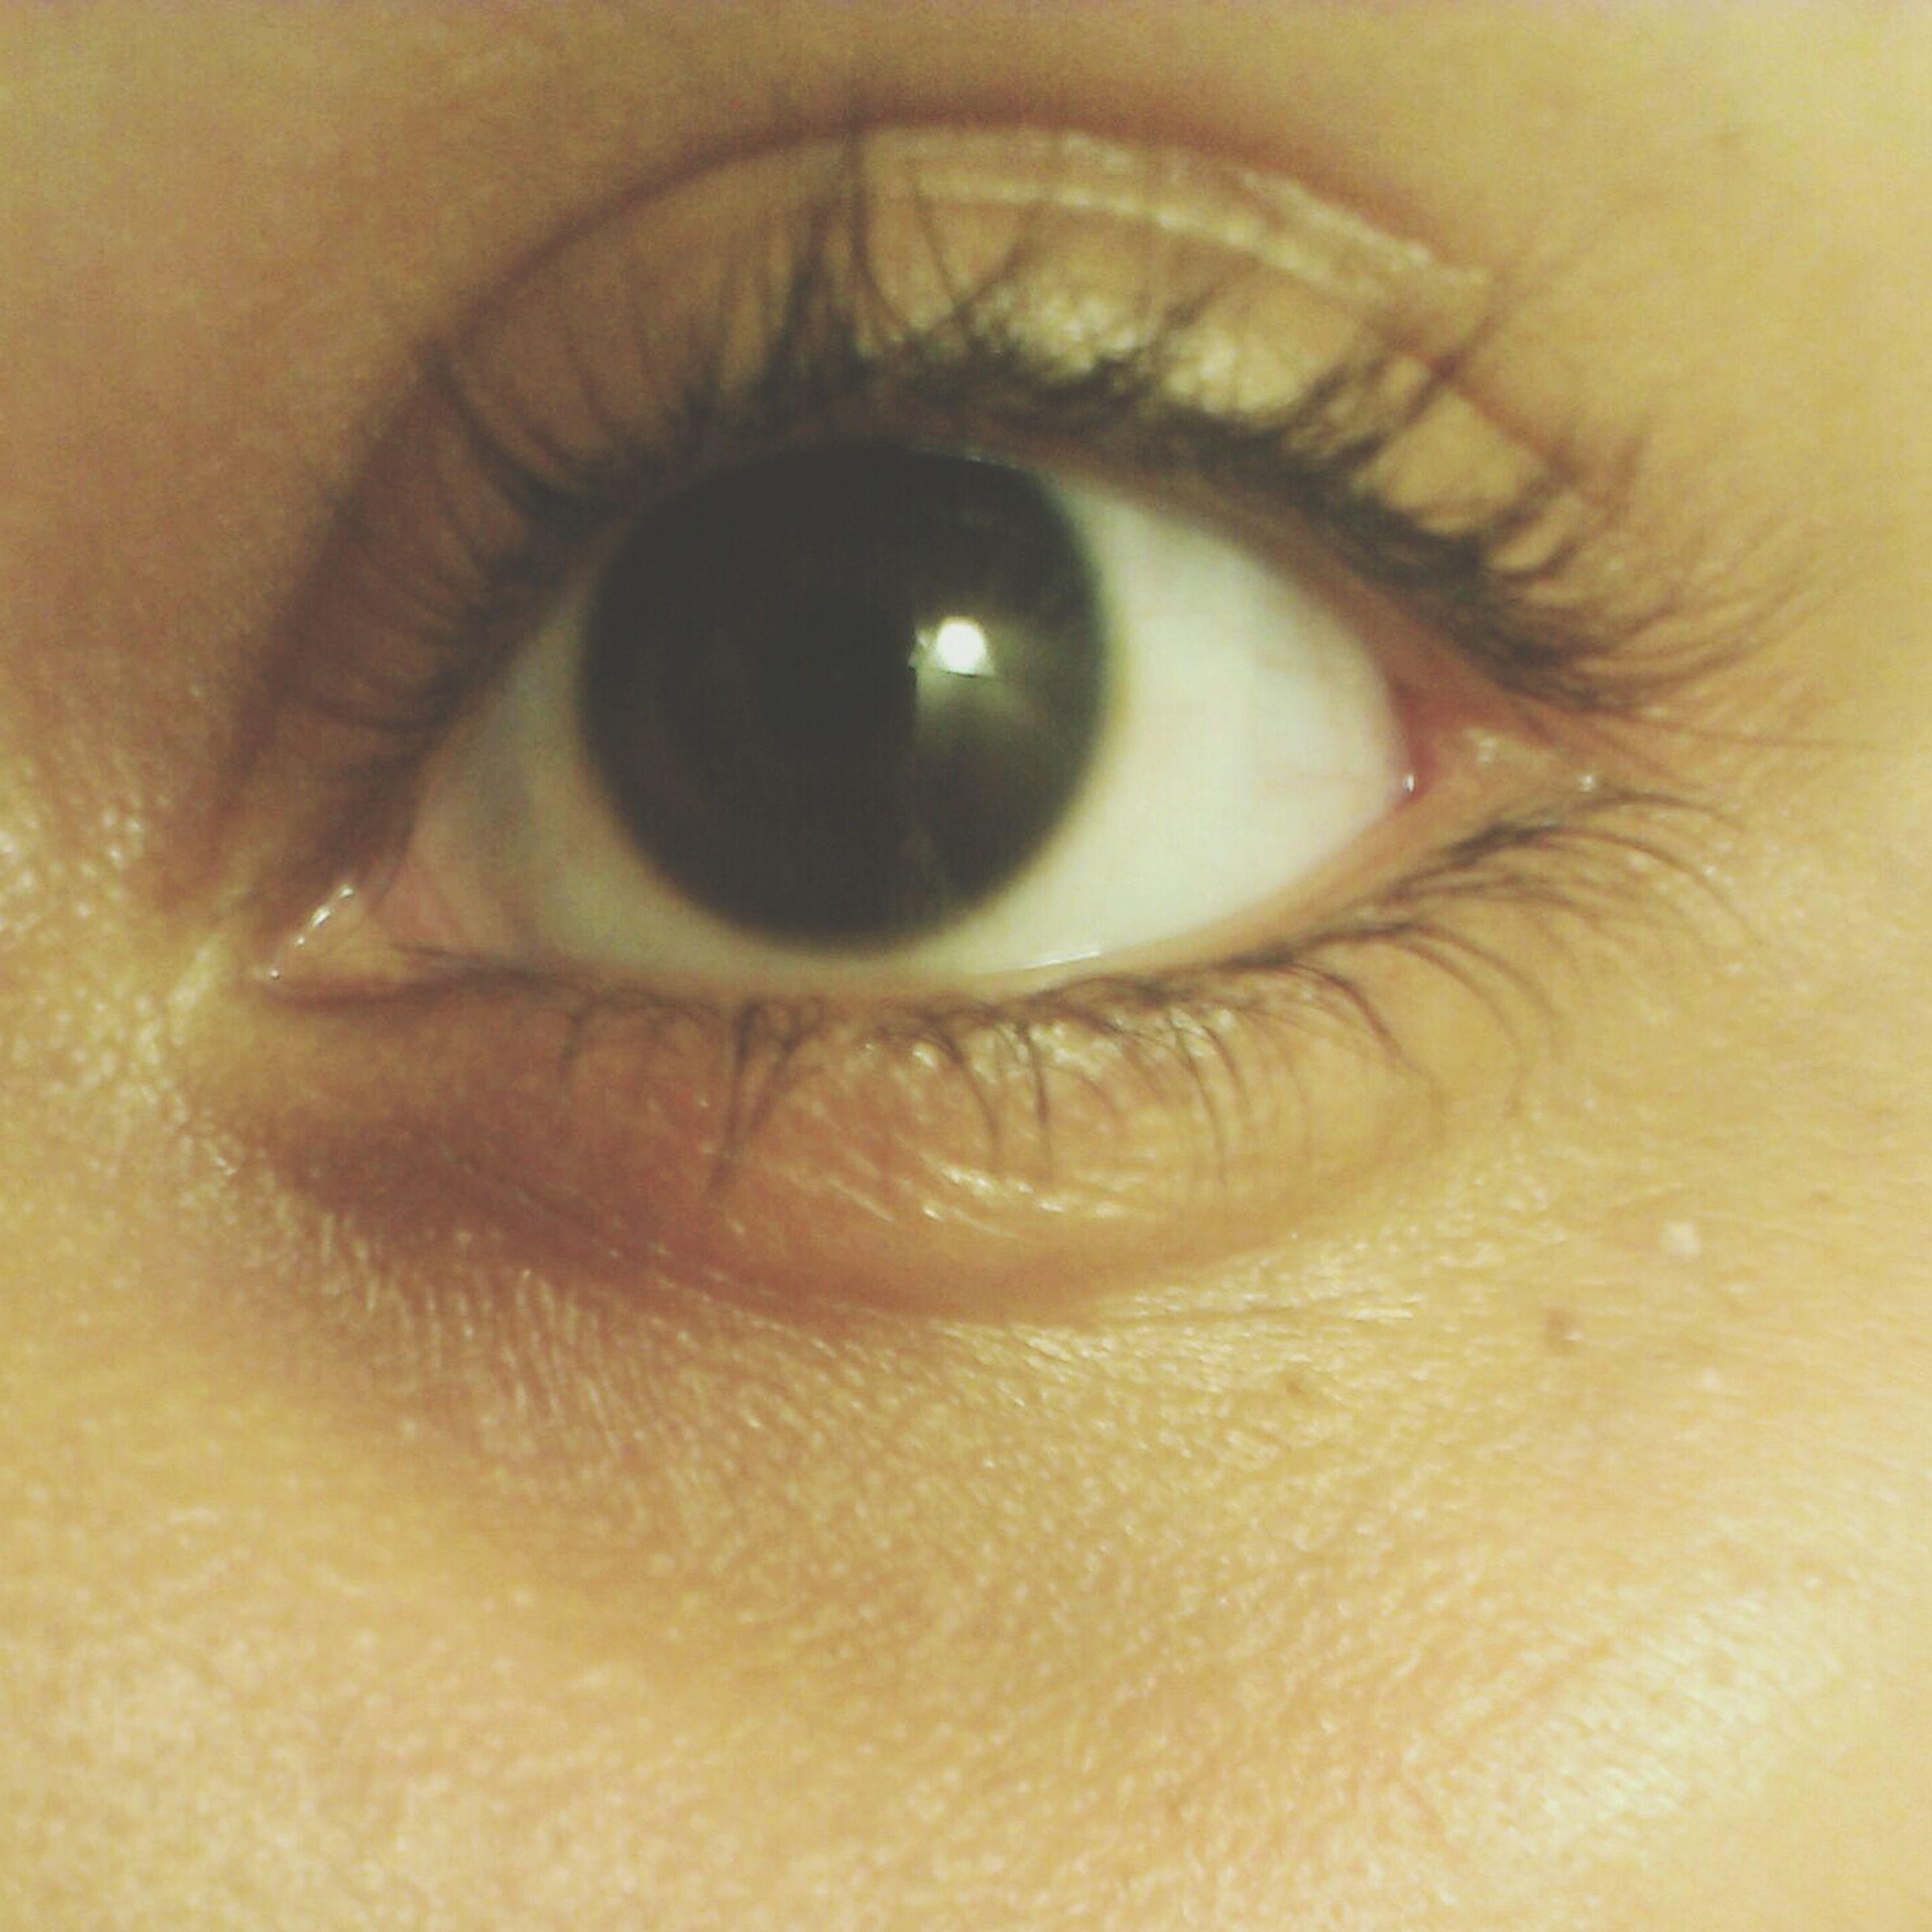 human eye, eyelash, close-up, eyesight, part of, sensory perception, human skin, looking at camera, portrait, human face, extreme close-up, iris - eye, eyeball, lifestyles, indoors, extreme close up, unrecognizable person